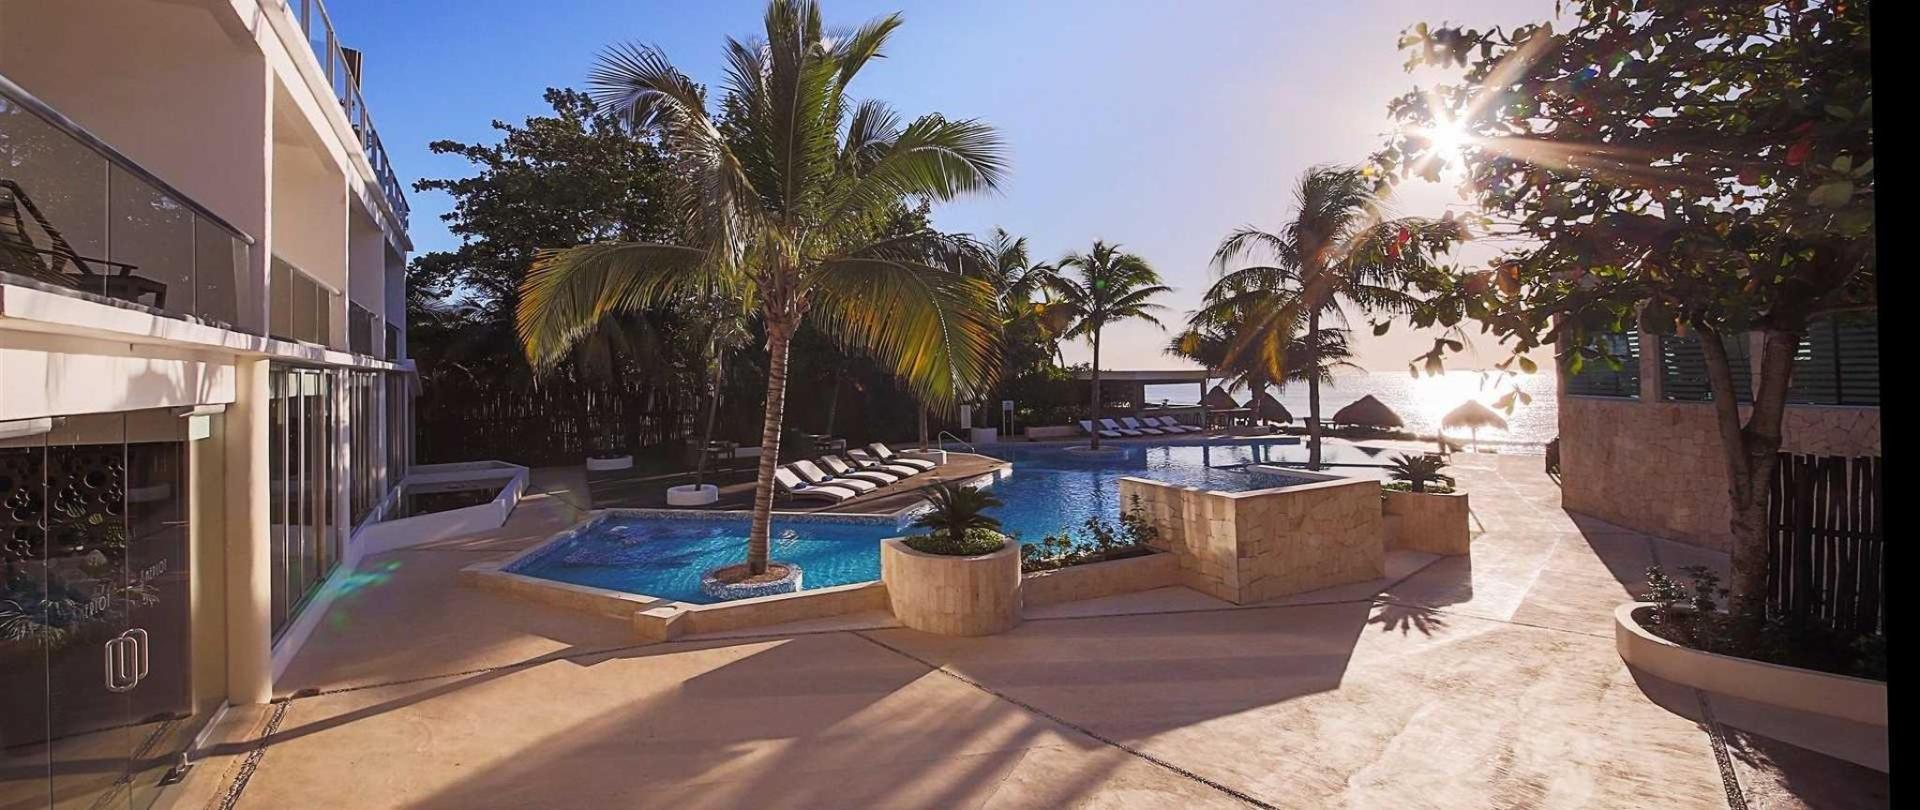 Le Reve Hotel And Spa Beachfront Boutique Hotel In Playa Del Carmen